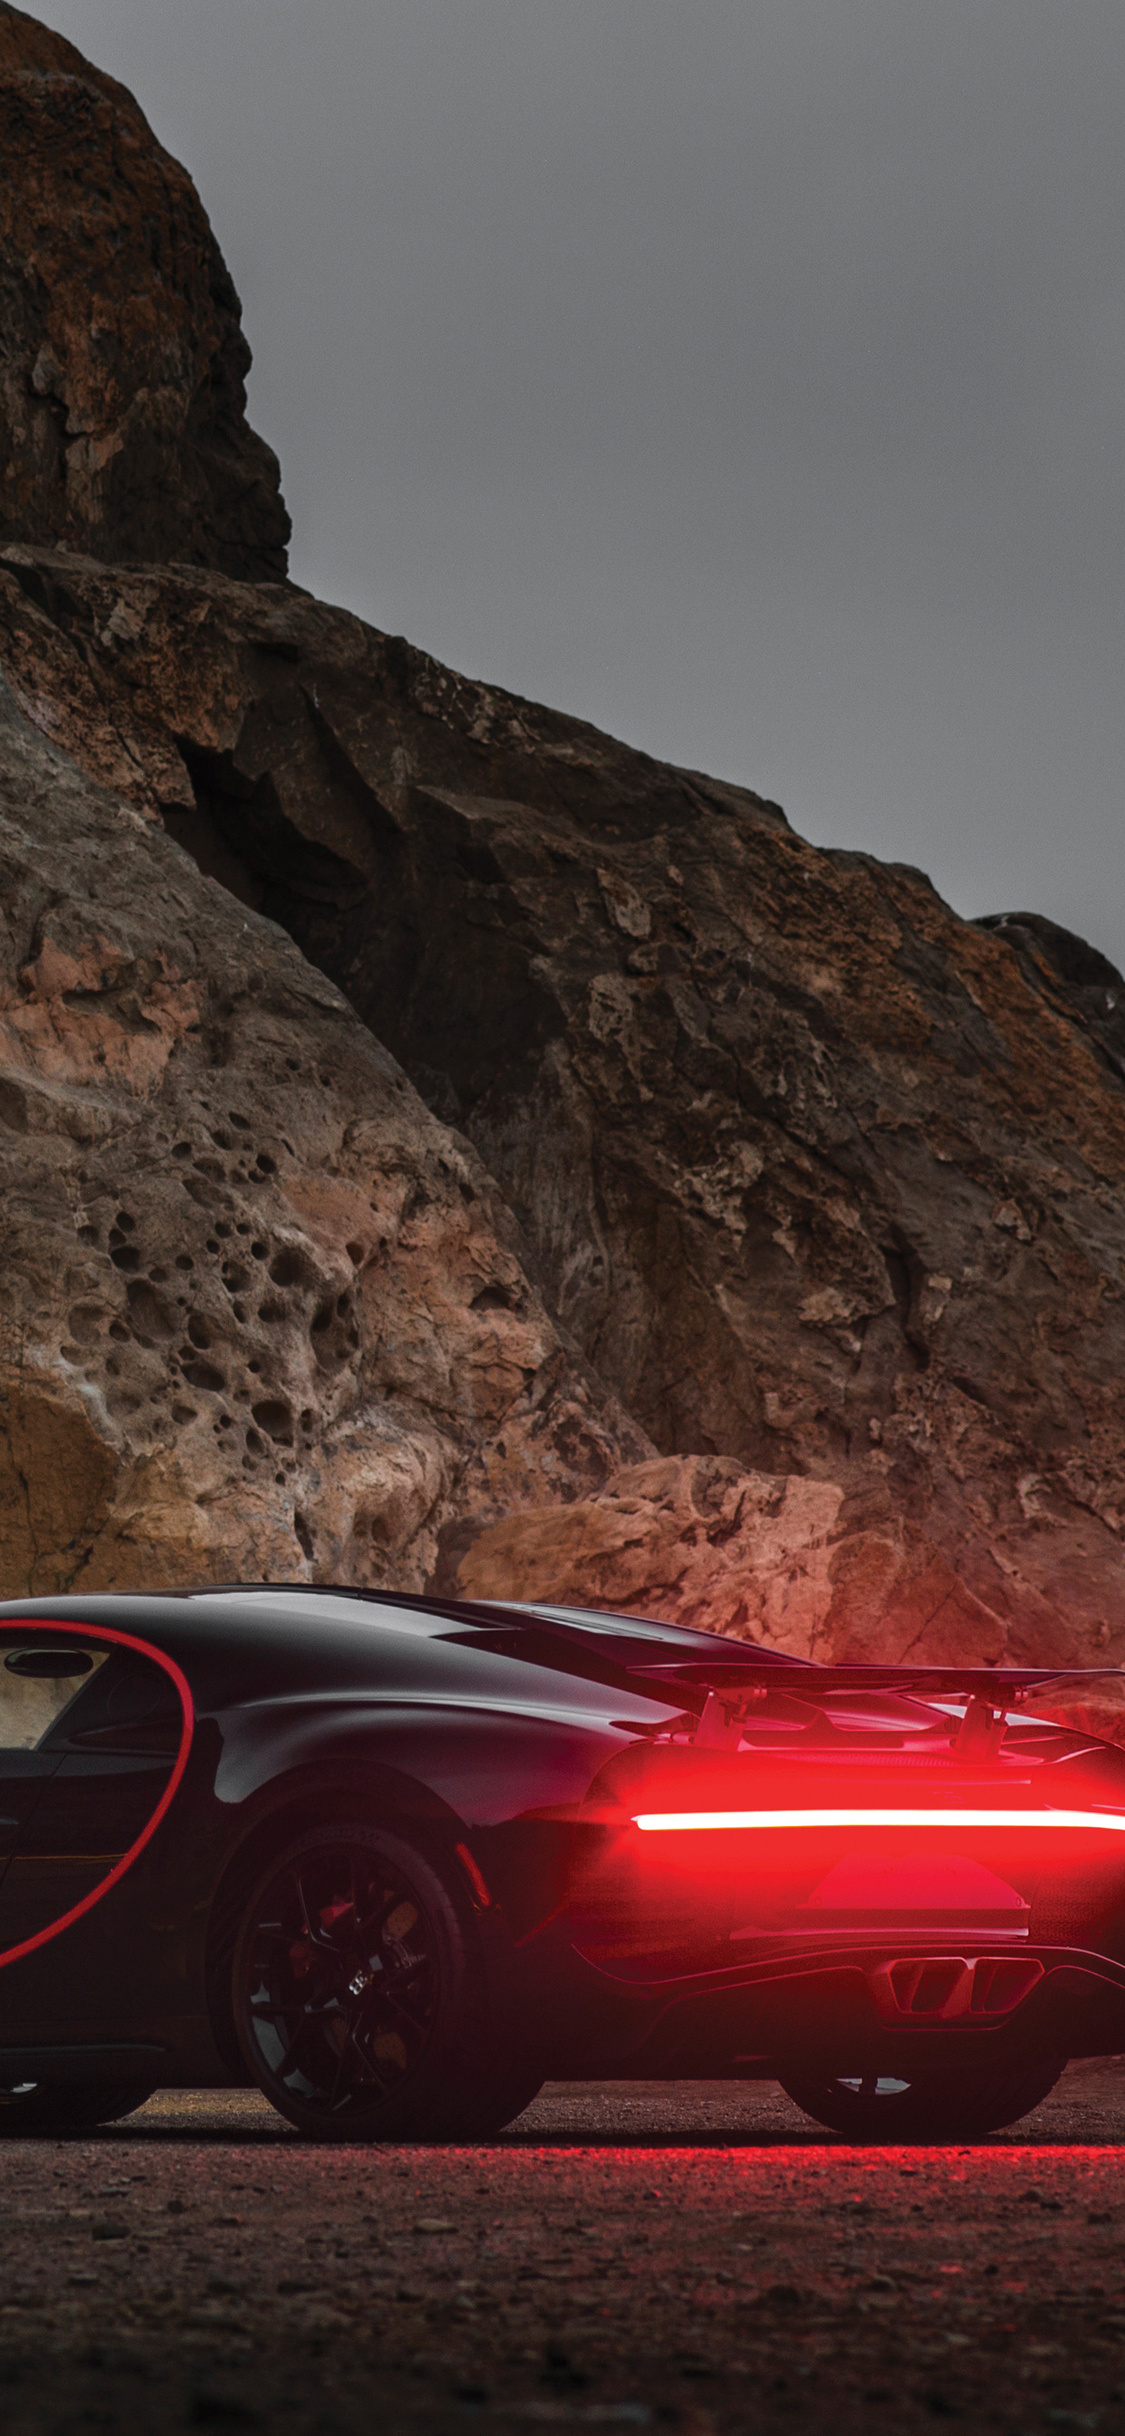 Car Wallpaper Iphone Xs Car Wallpaper